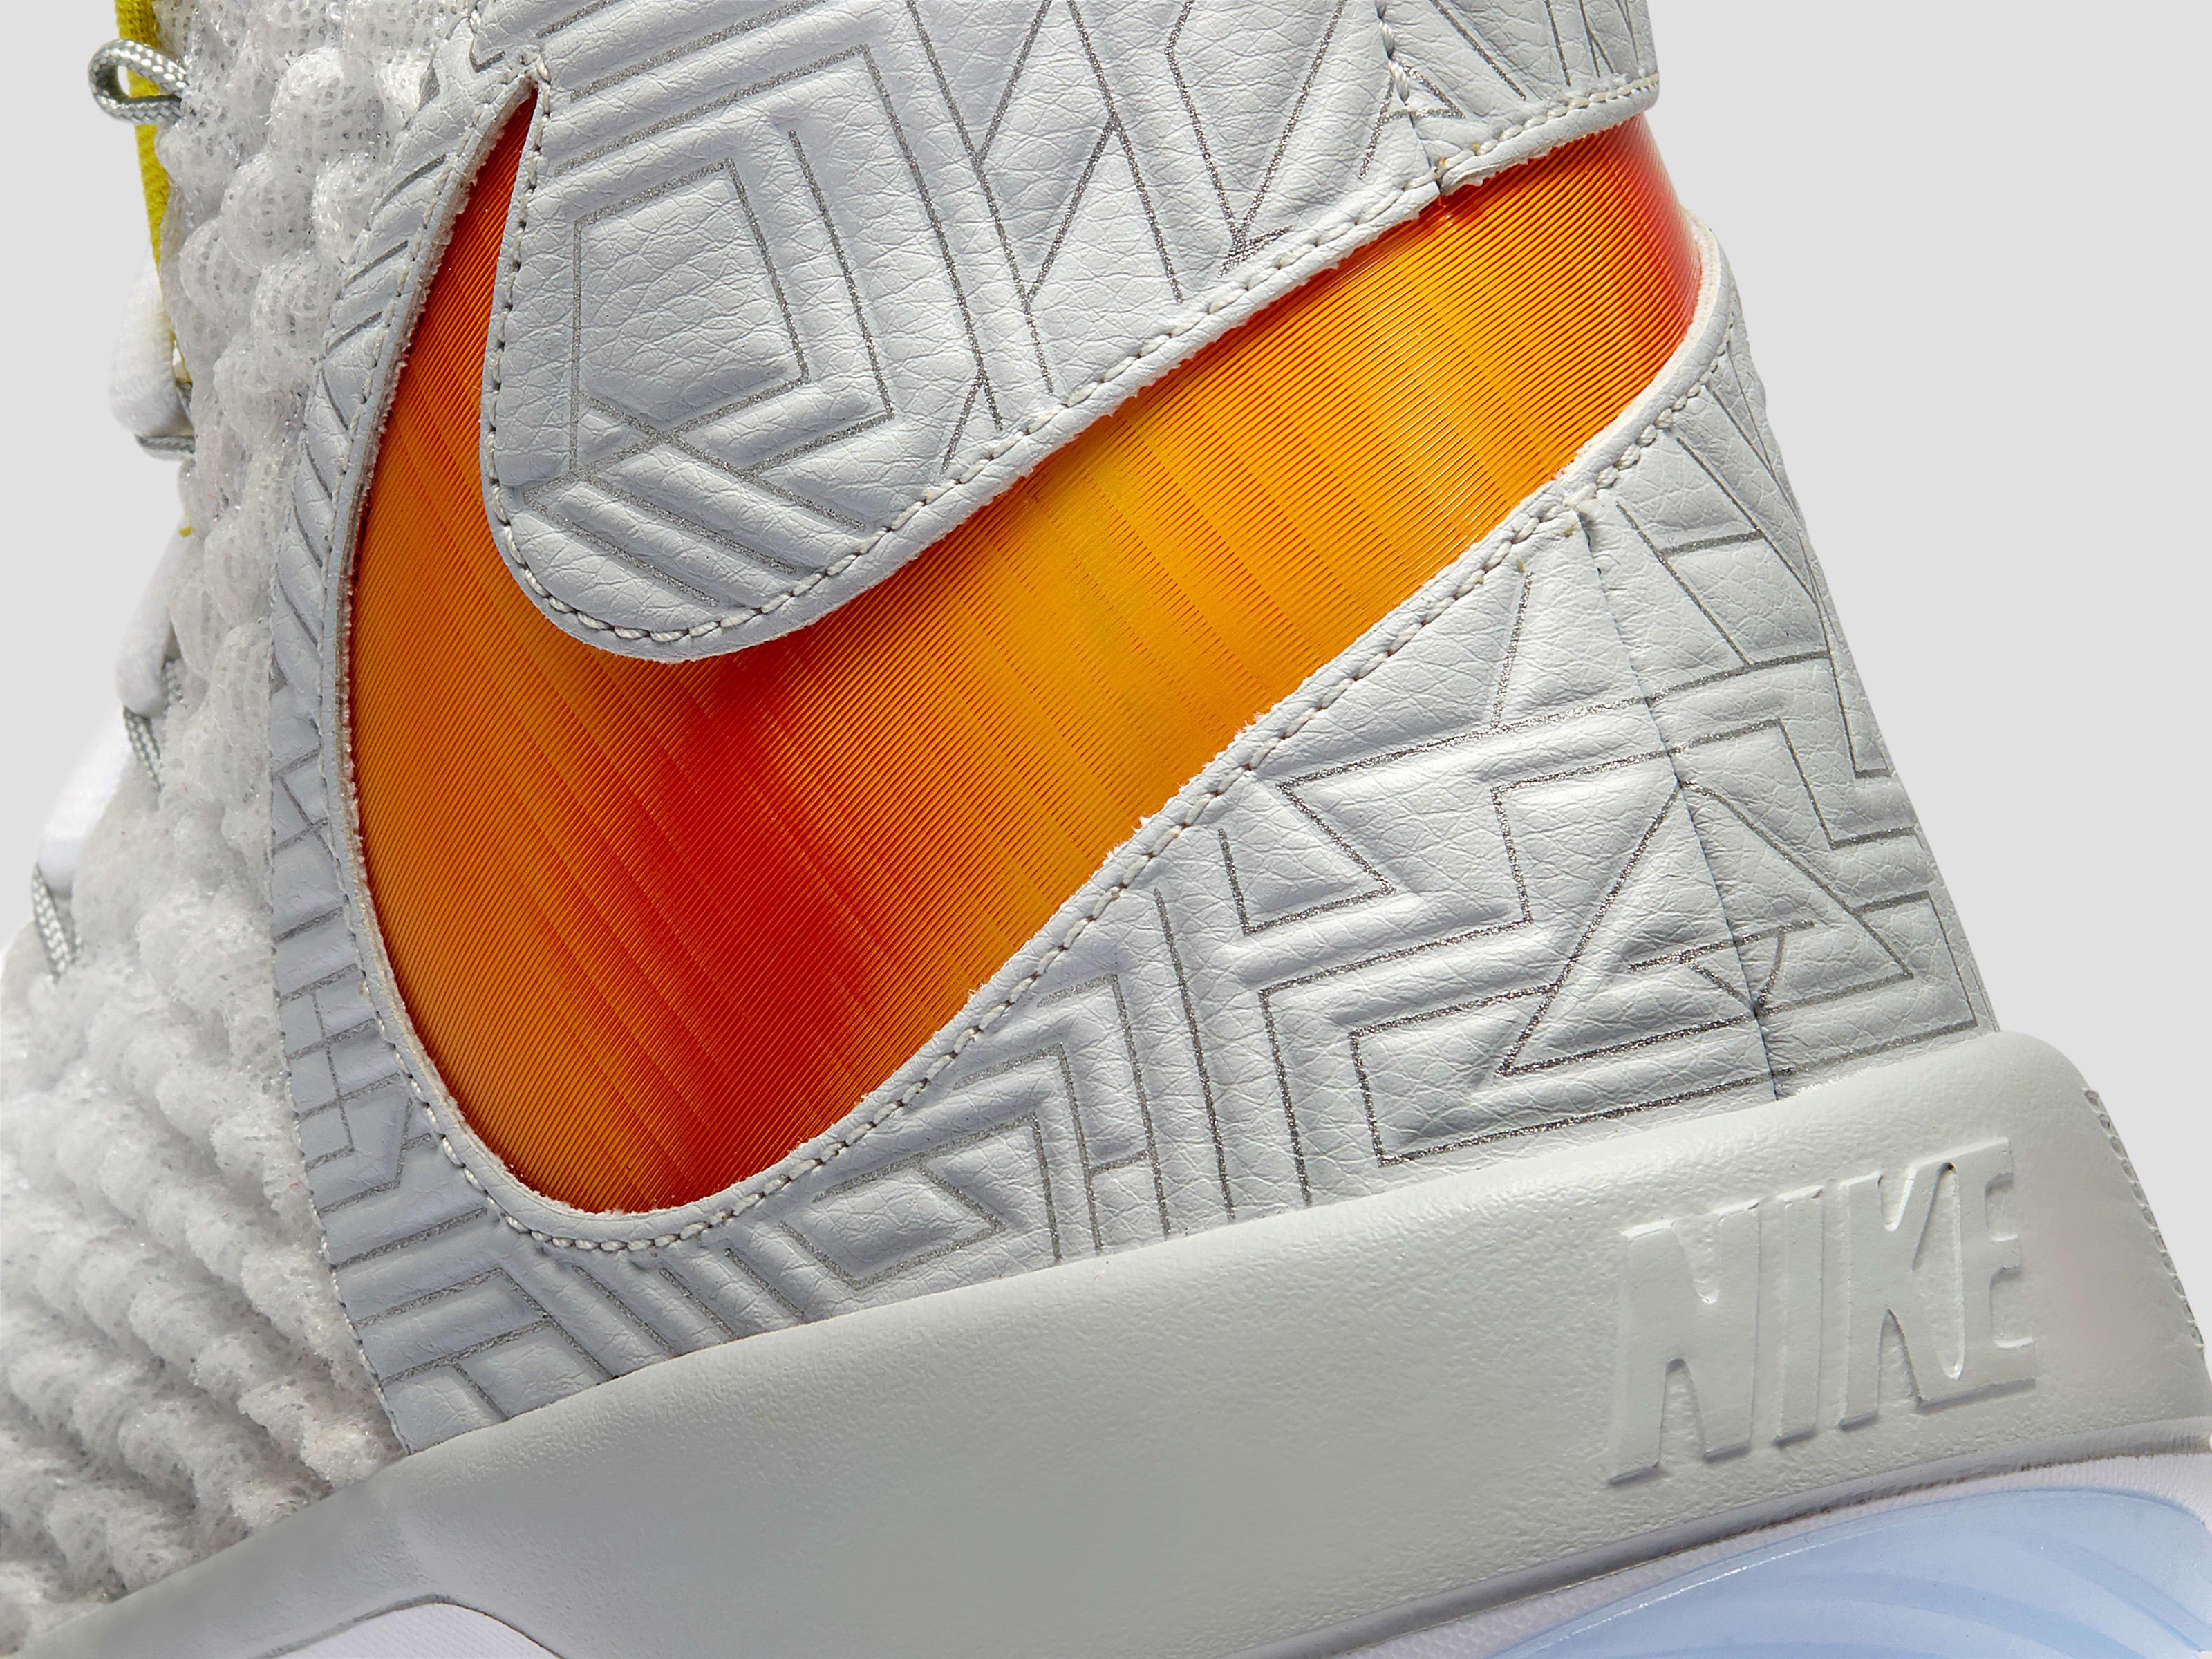 Nike AlphaDunk (Detail)